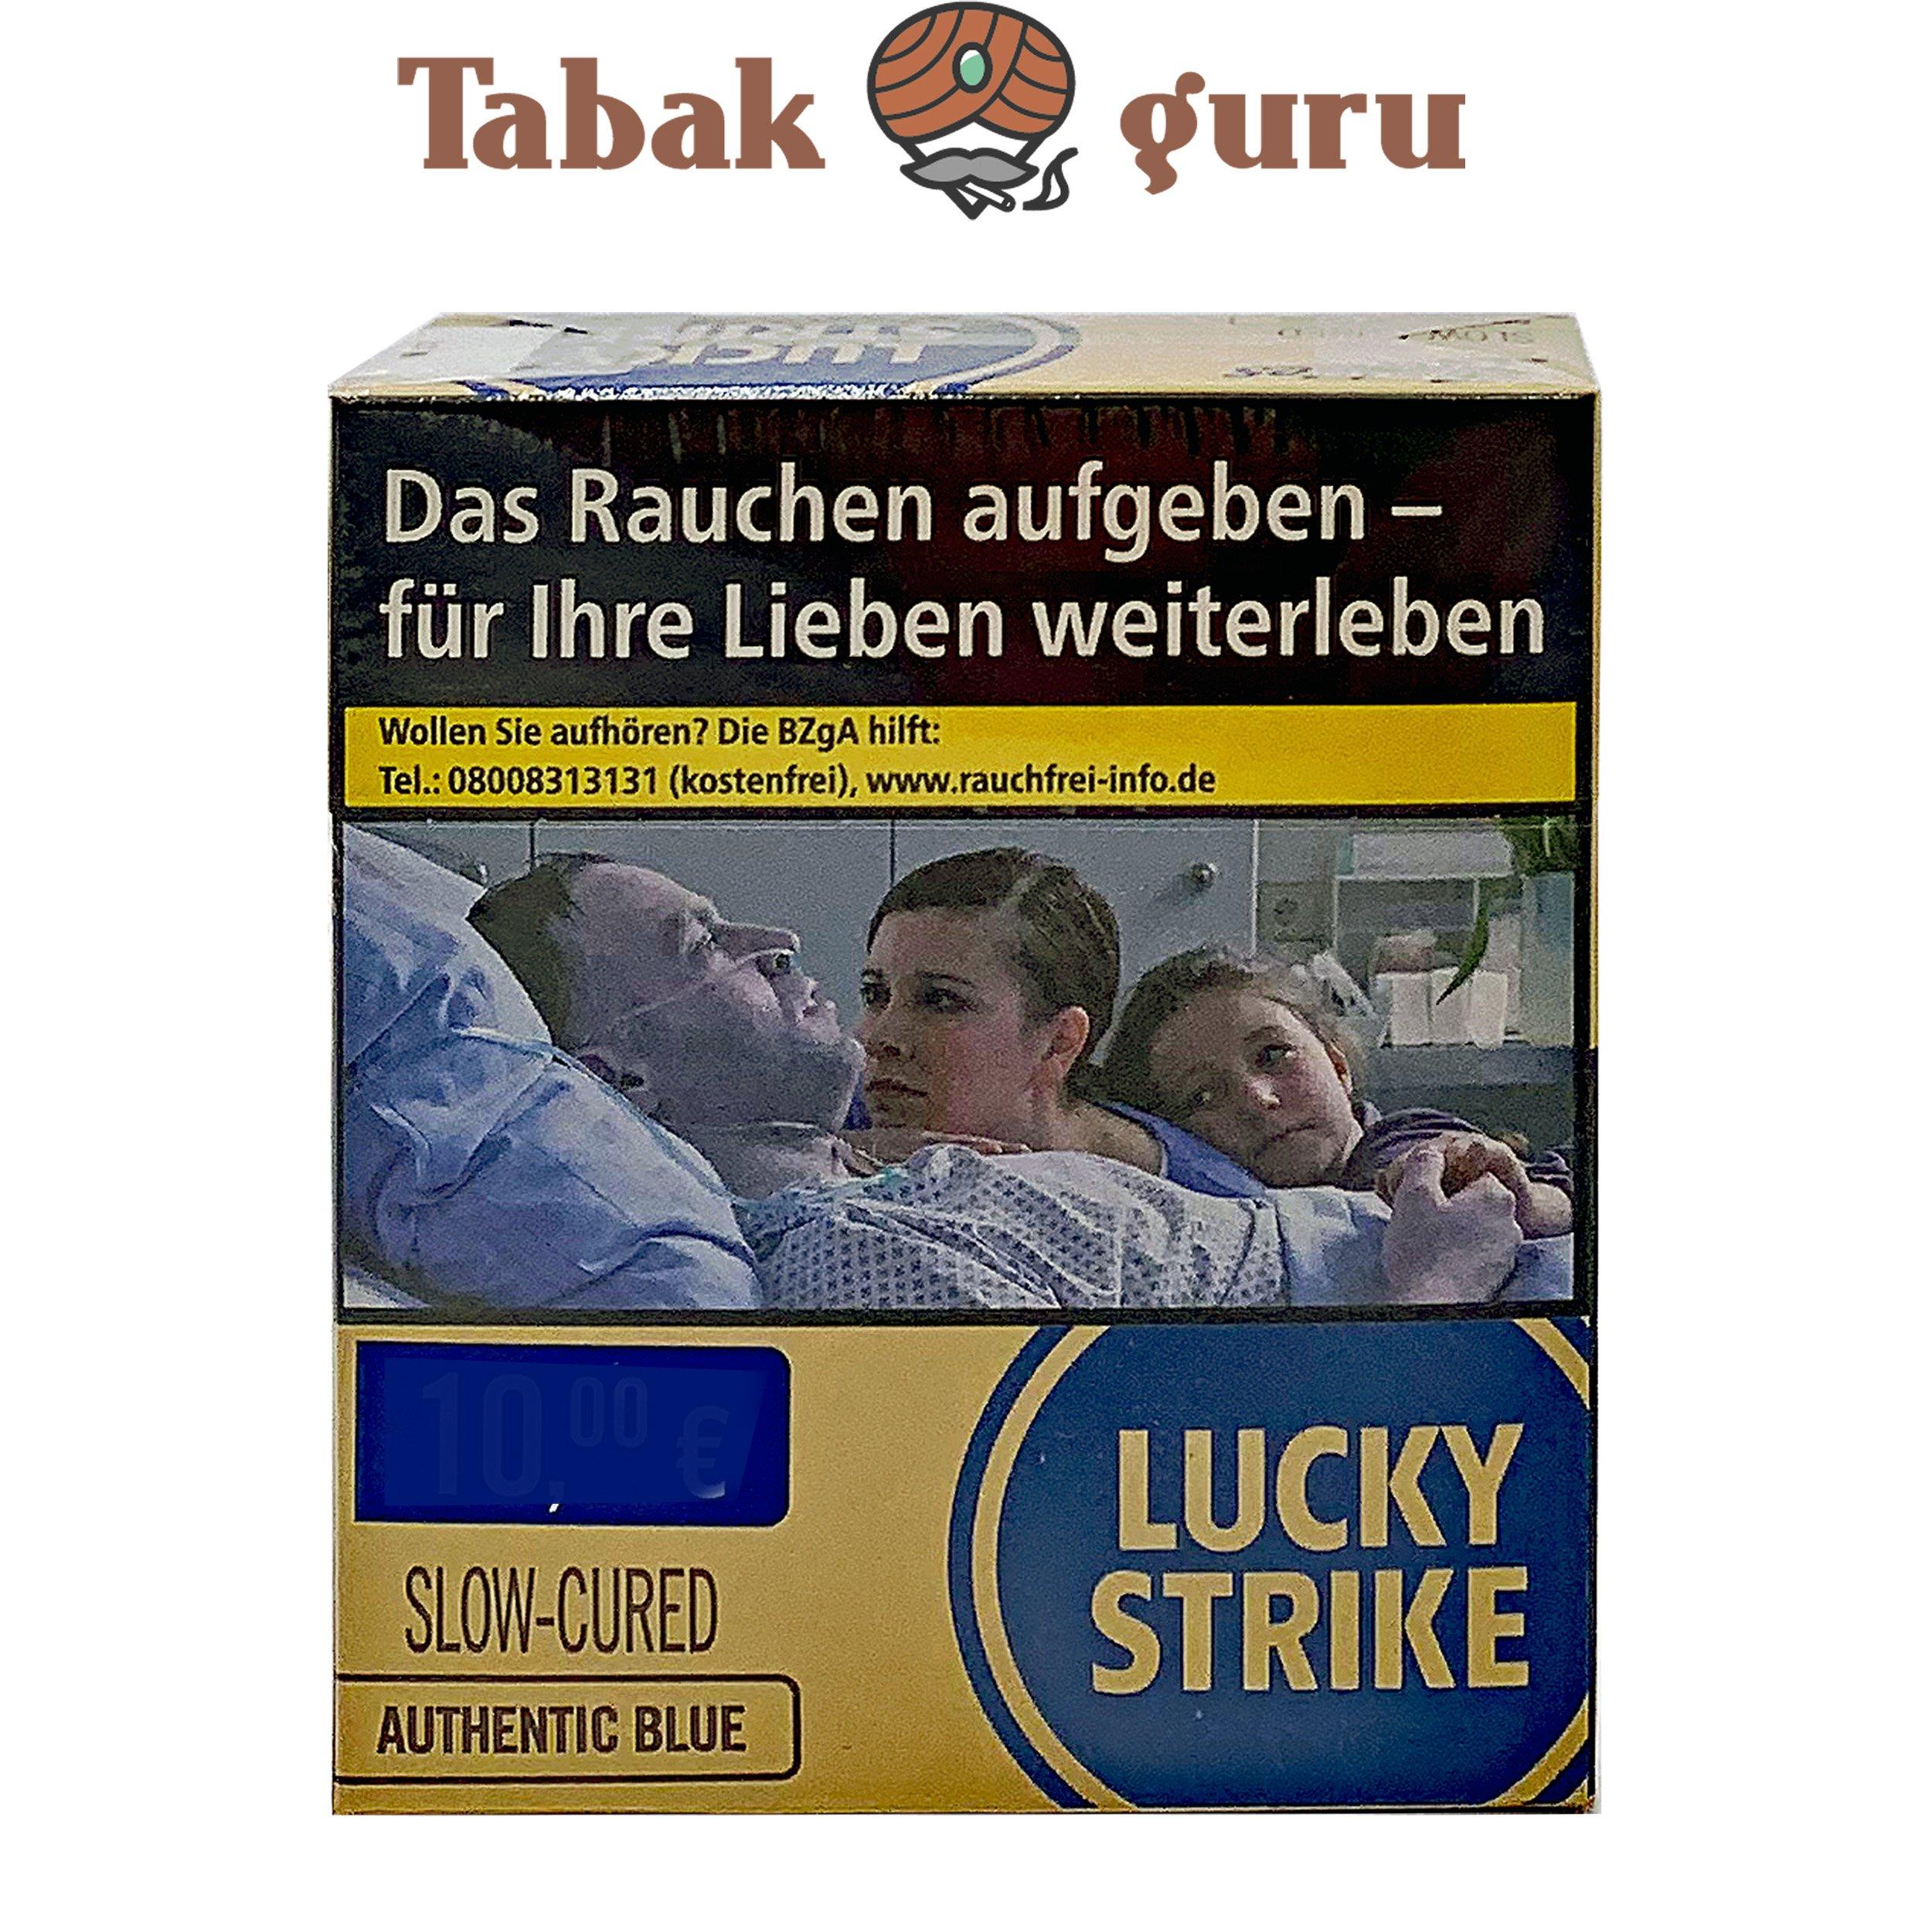 Lucky Strike Authentic Blue Zigaretten Giga Box (ohne Zusätze) Inhalt 31 Stück